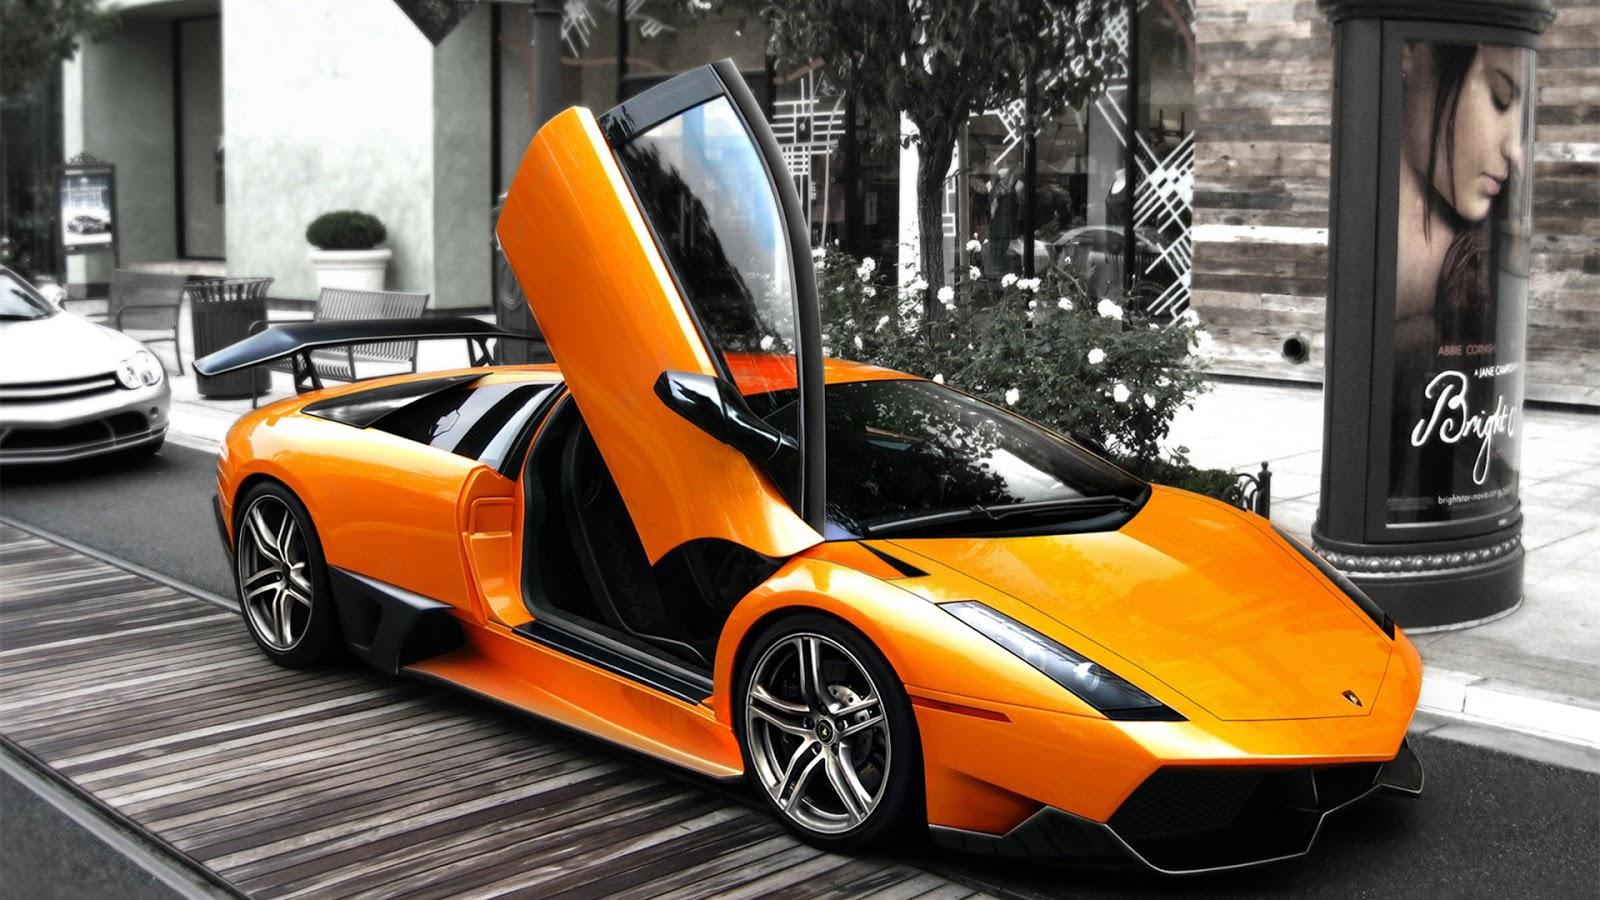 Super Cars Hd Wallpaper: Super HD Wallpapers For PC